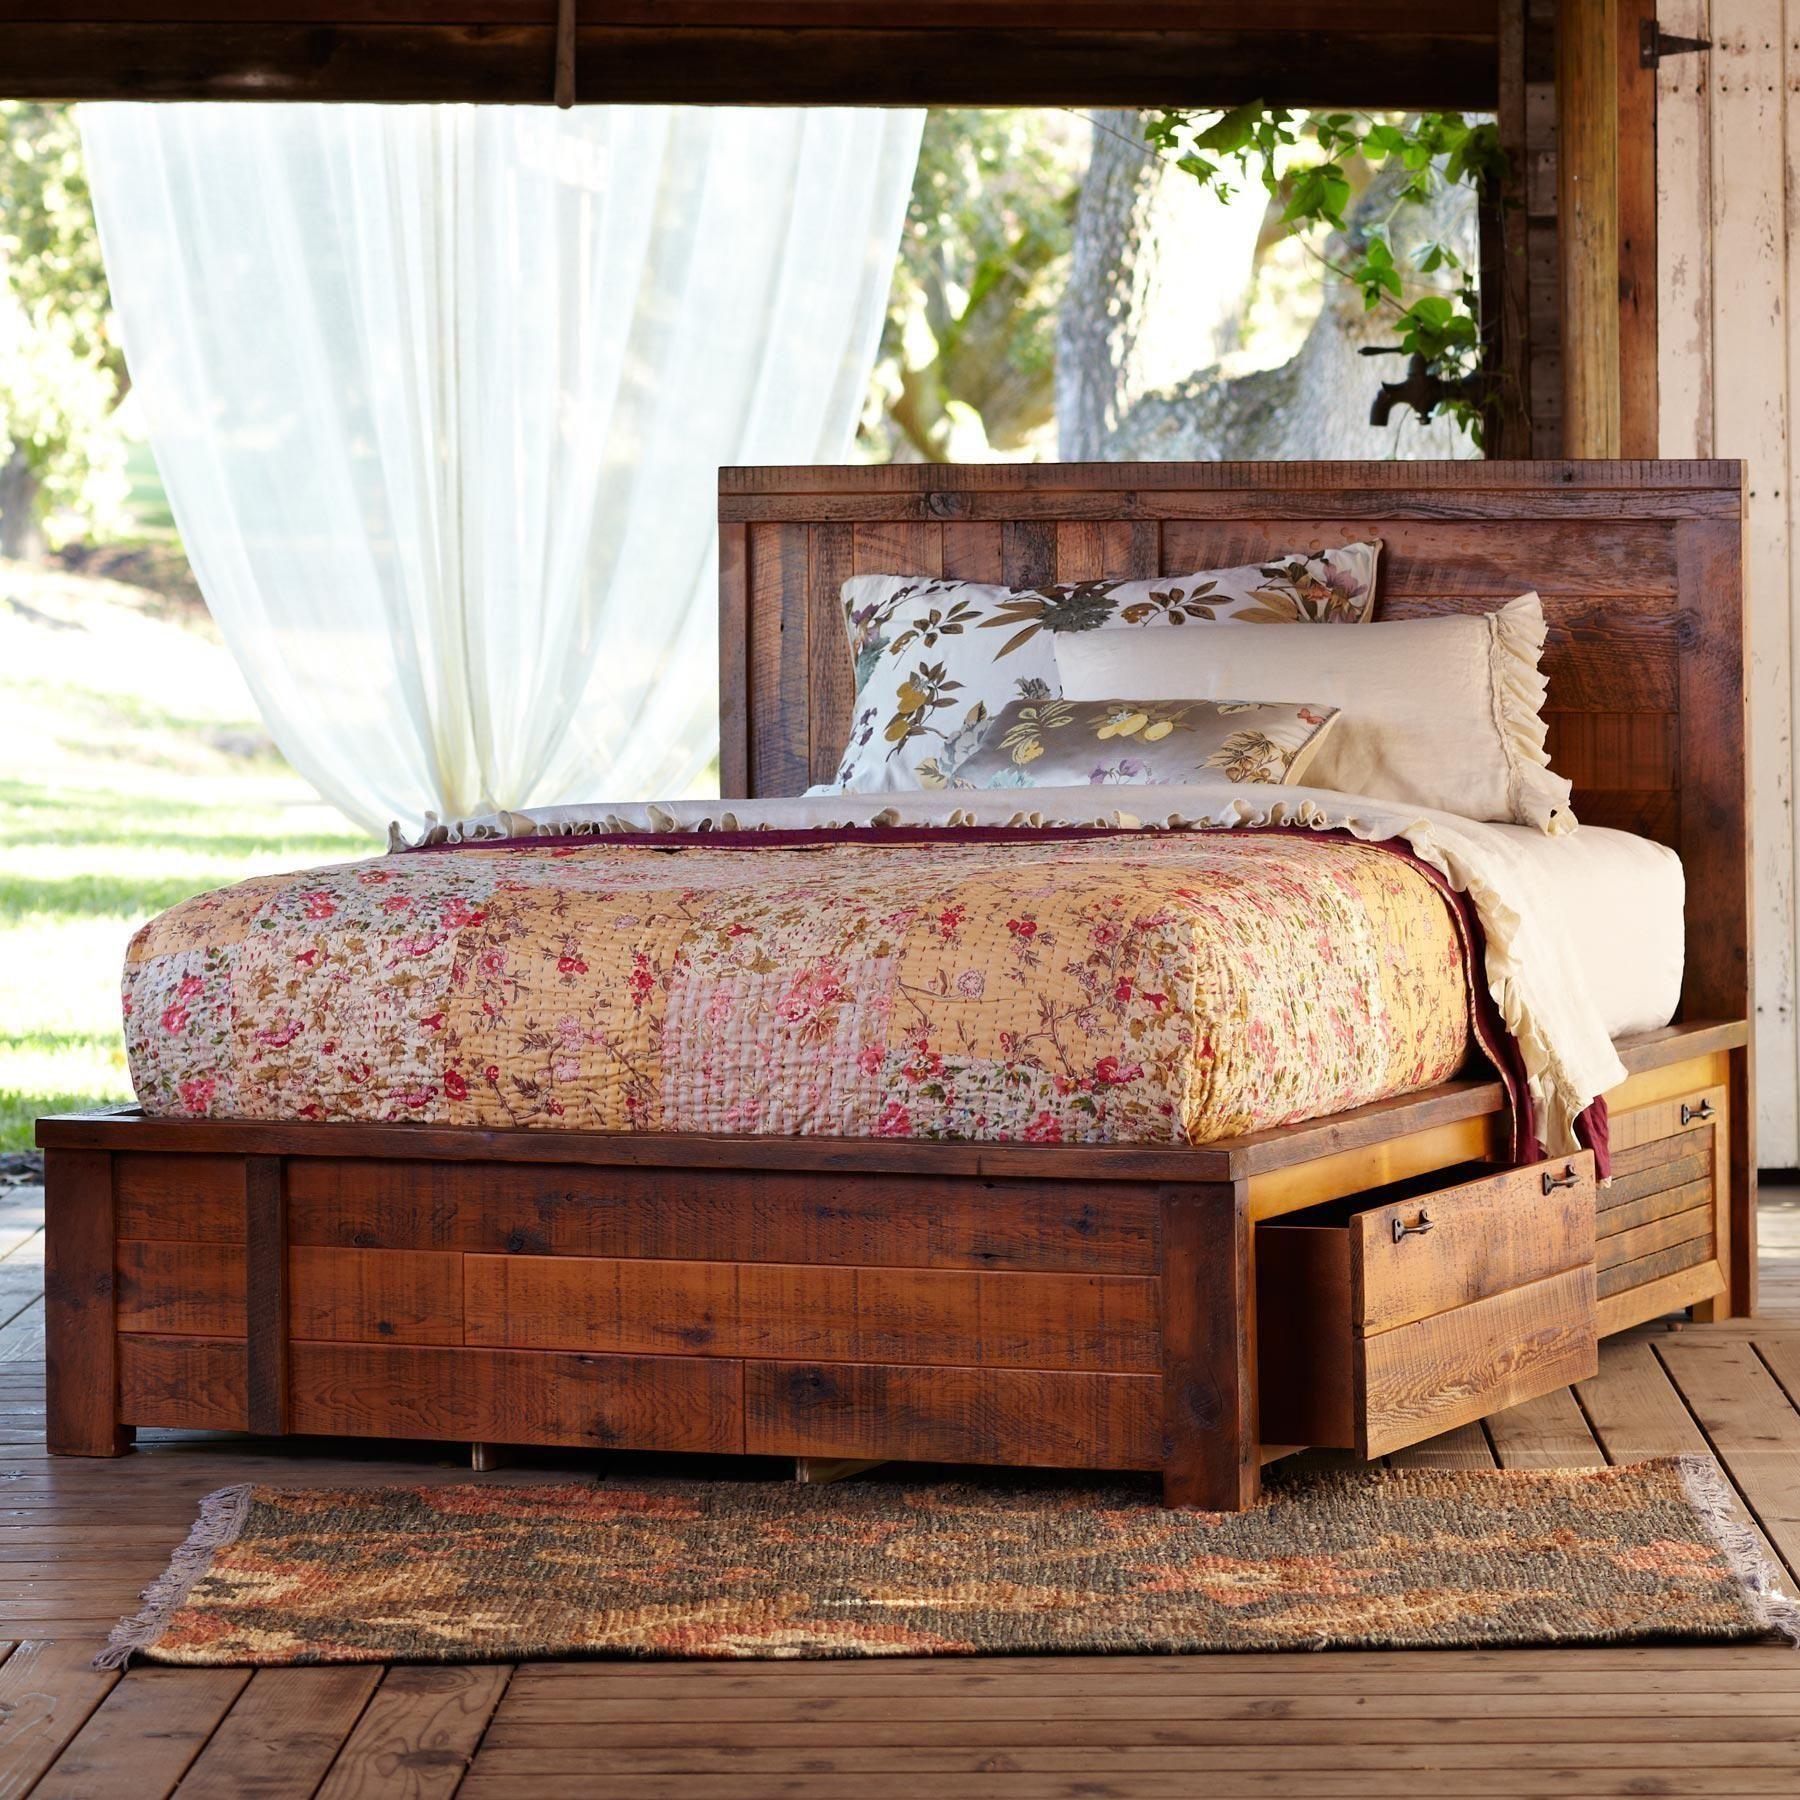 35 Unique DIY Pallet Bed Frame Ideas (With images